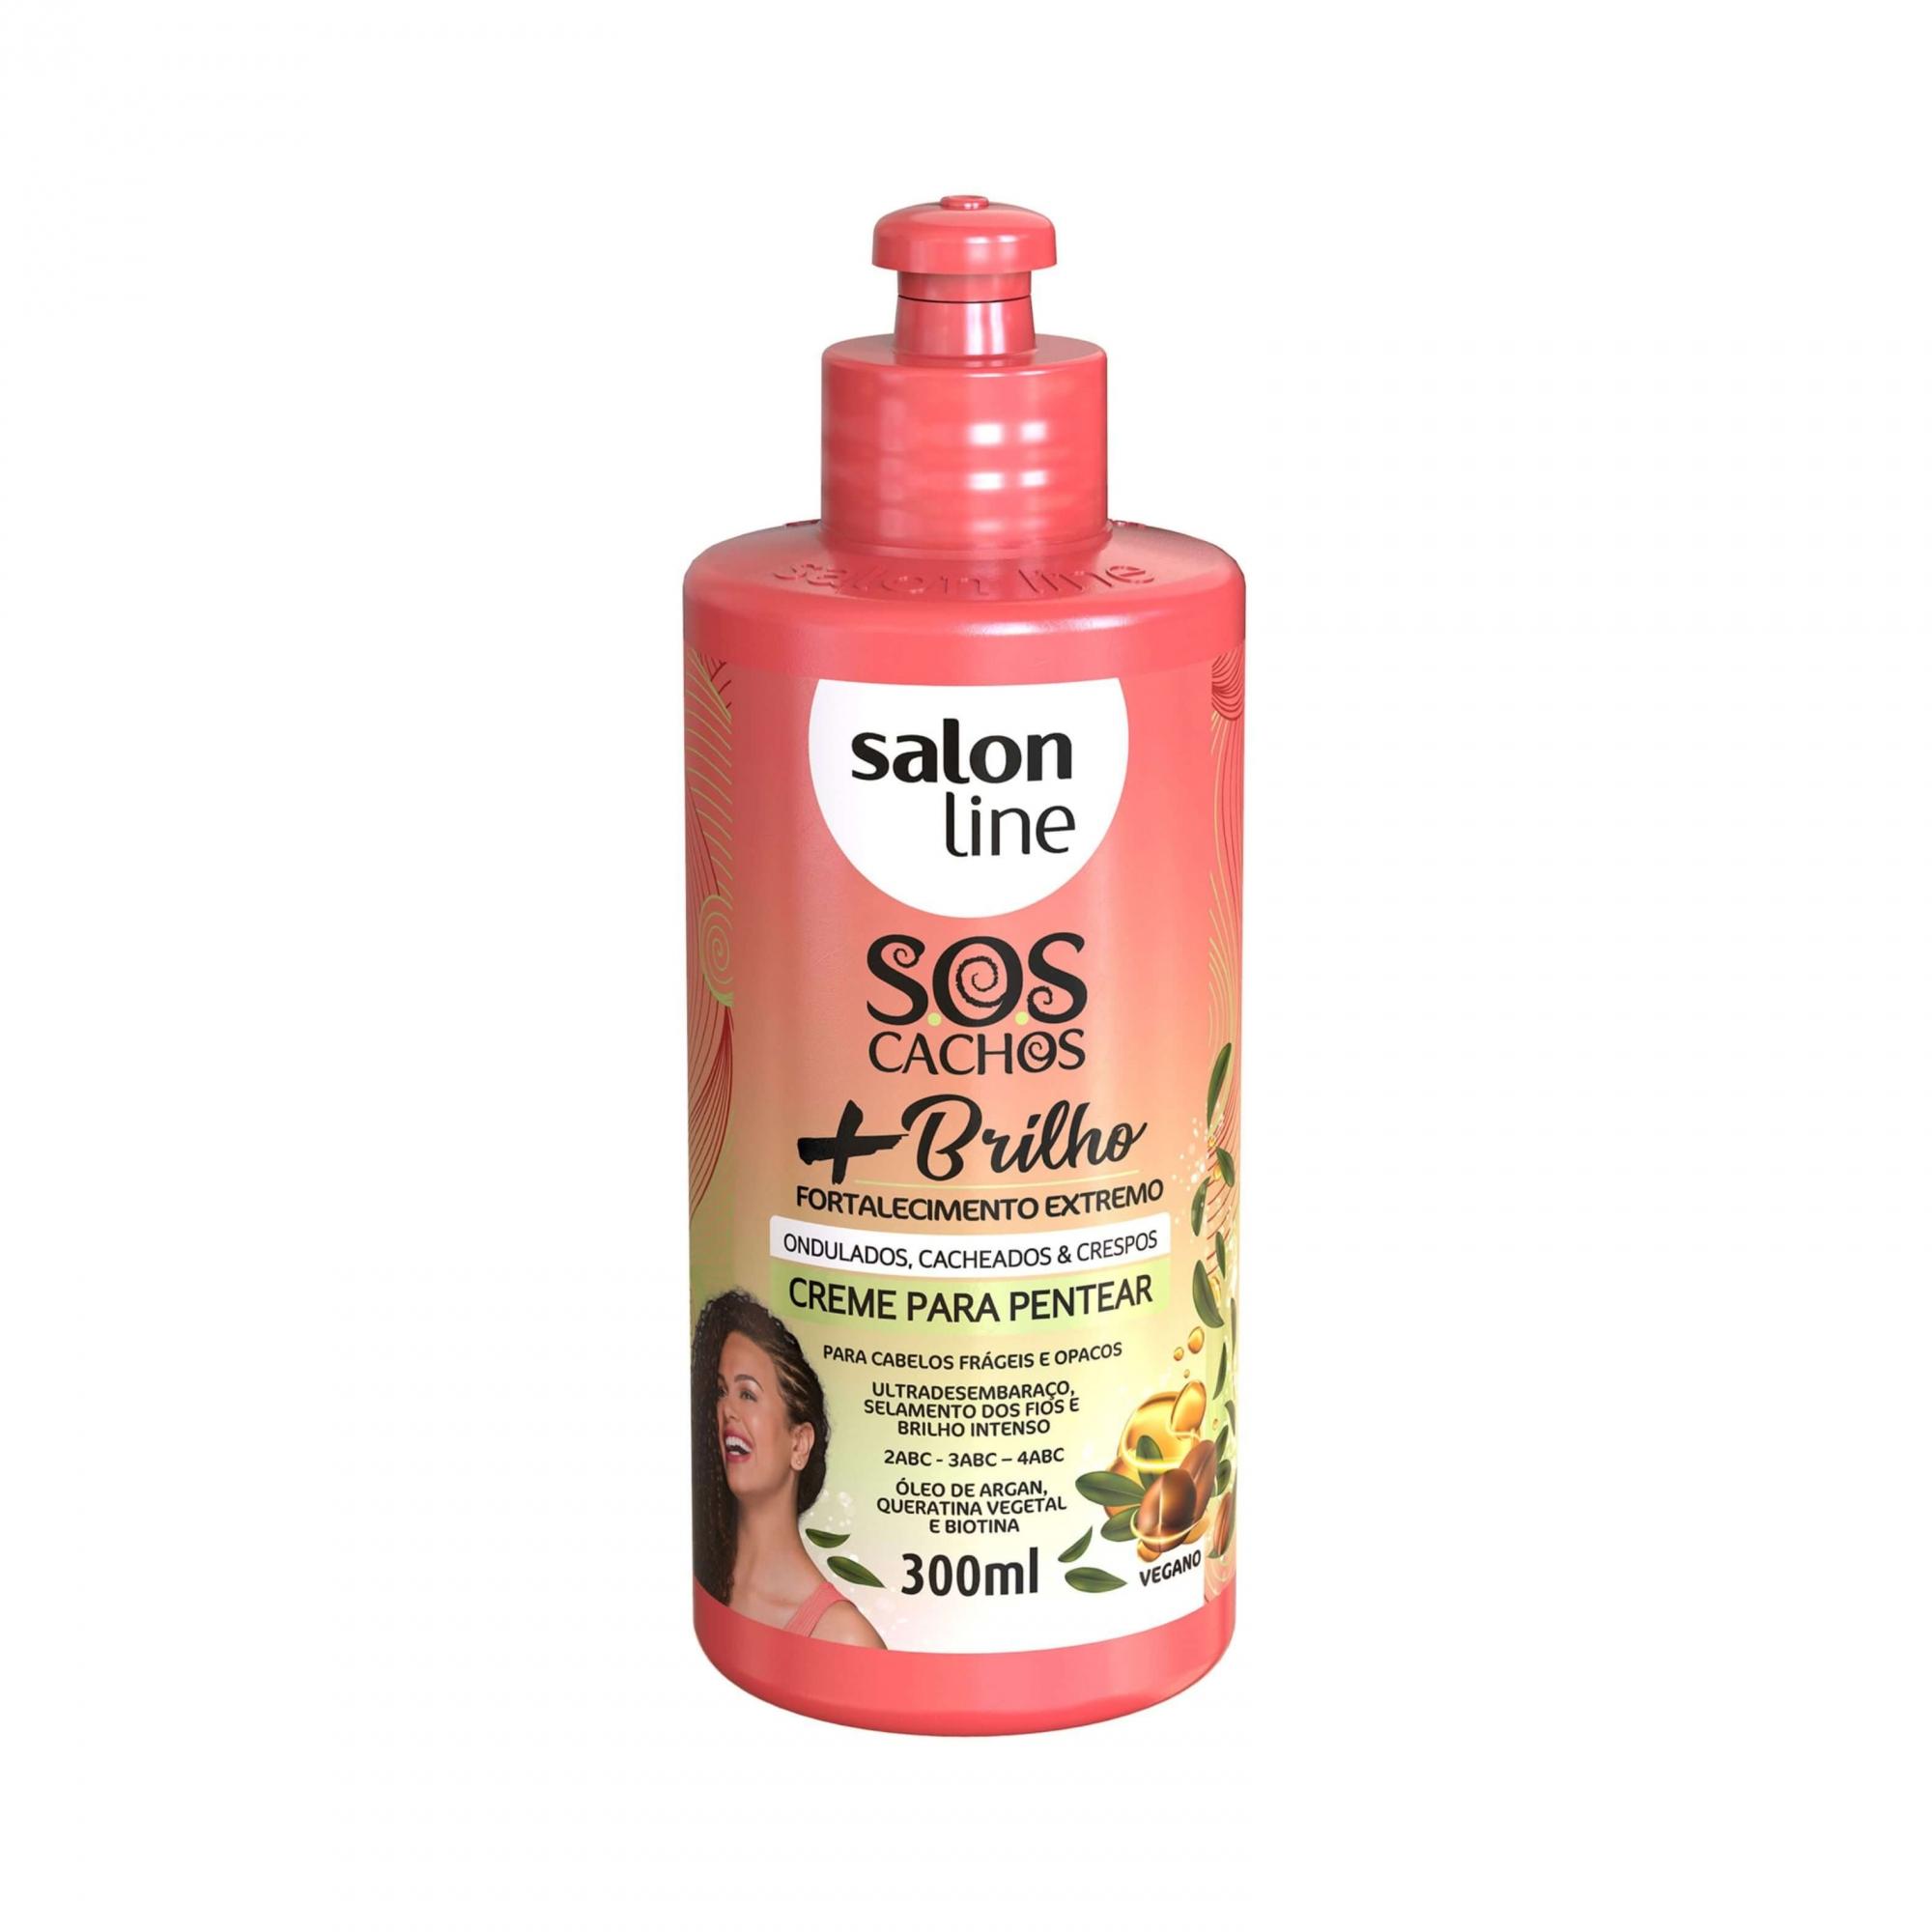 Creme Para Pentear Sos Cachos + Brilho  - Salon Line 300ml